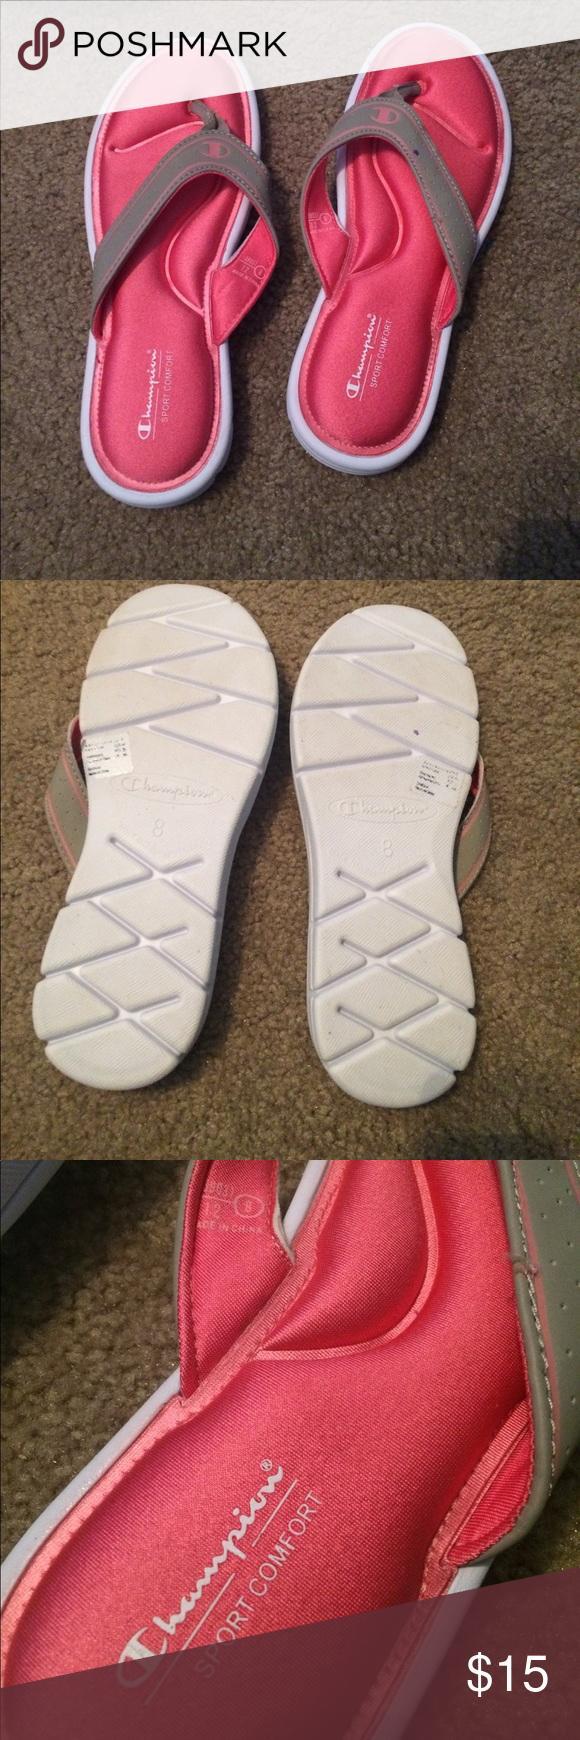 76363cffb63 Champion sport comfort flip flops Pink sport comfort sandals. Worn once  with little damage. Fits true to size. Champion Shoes Sandals